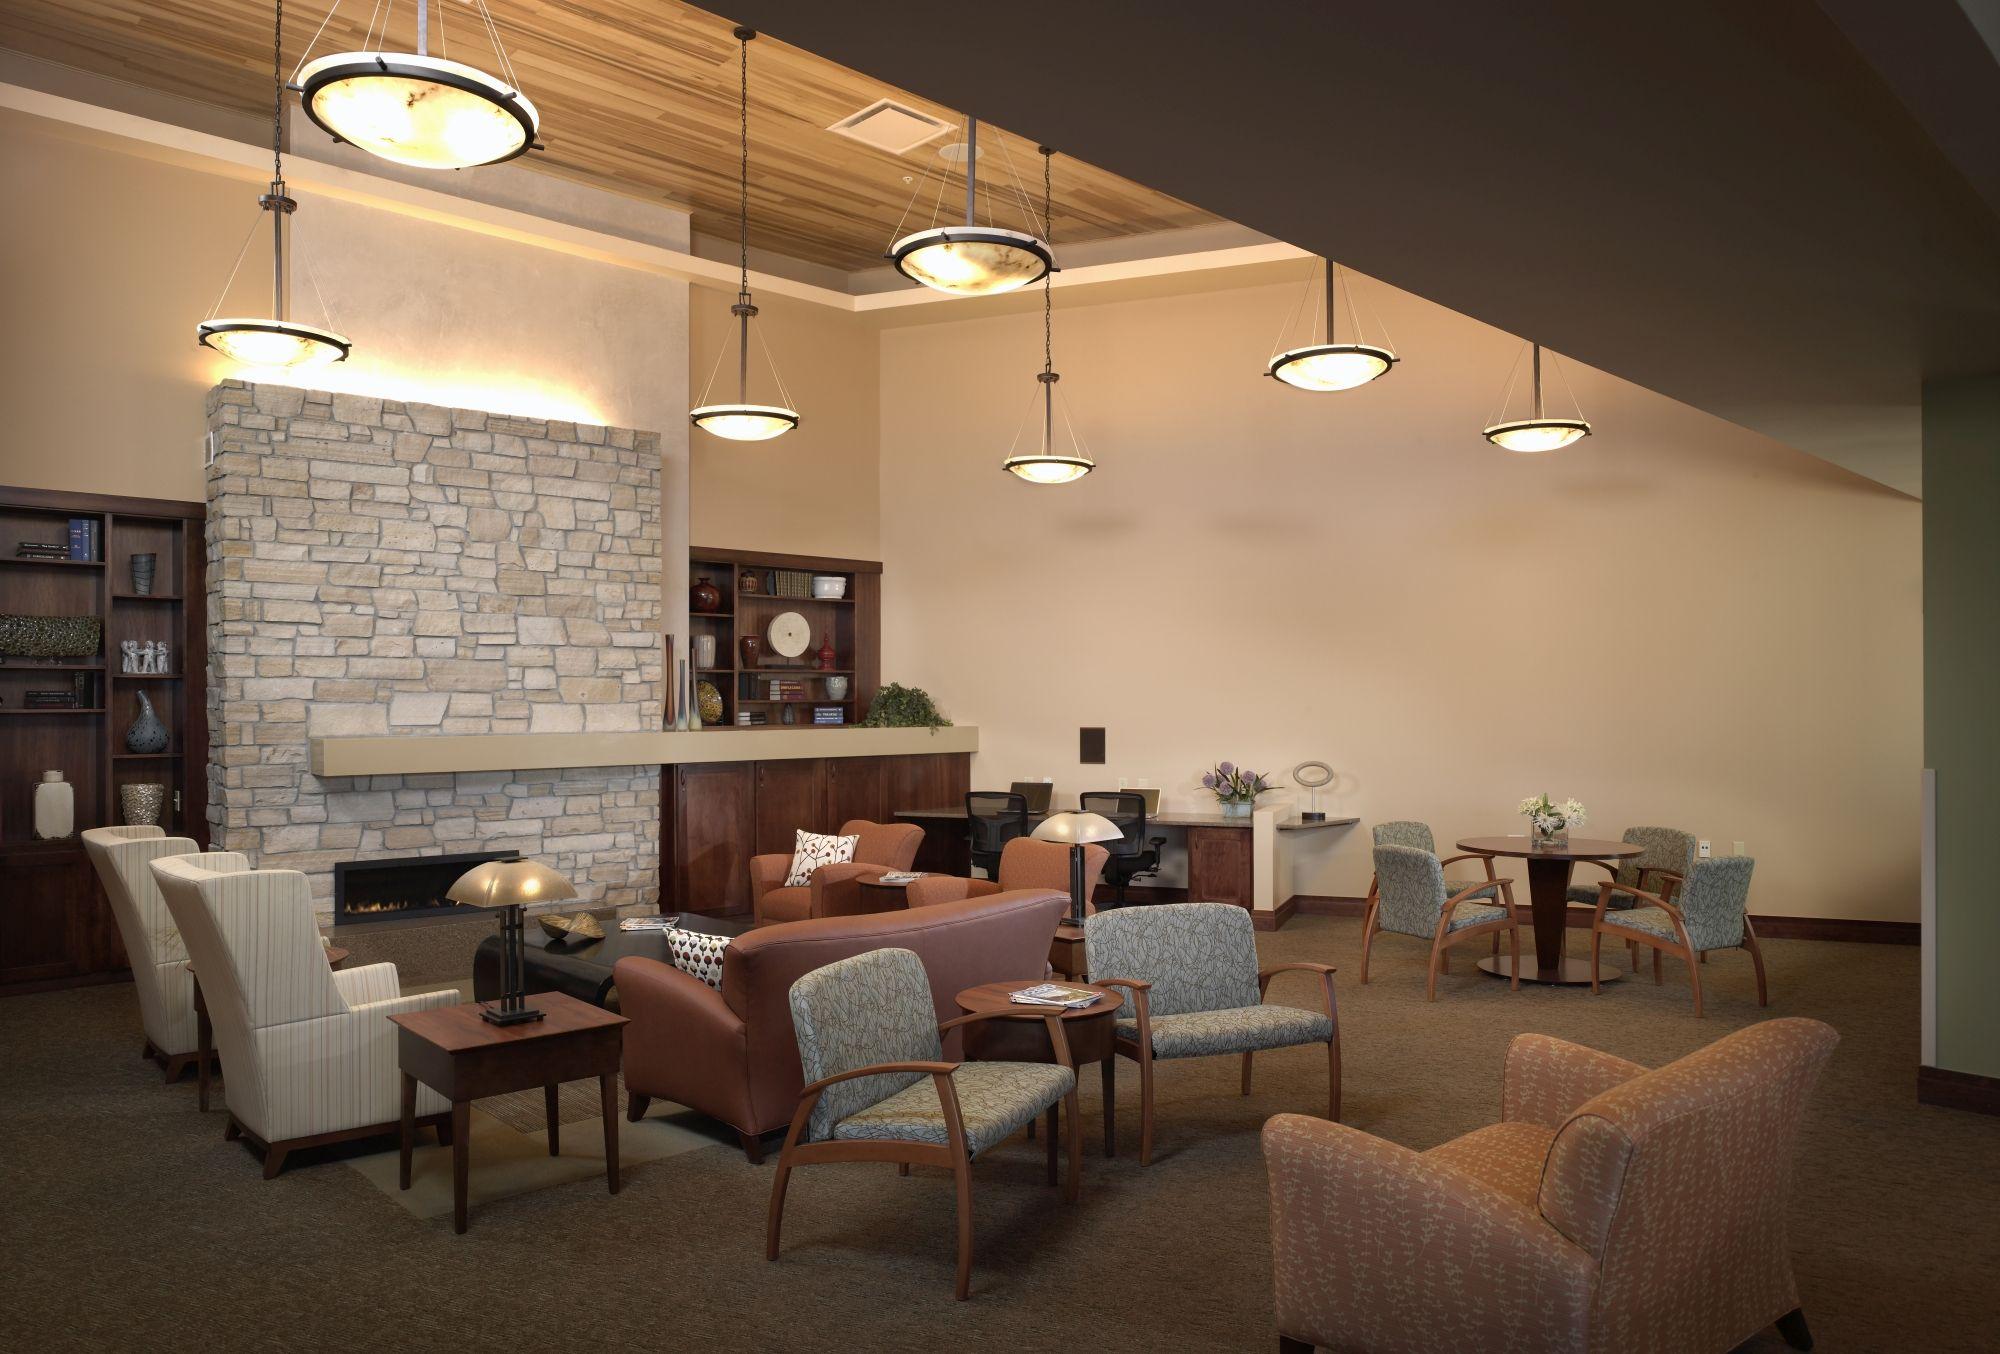 Denver Hospice Greatroom 1.jpg